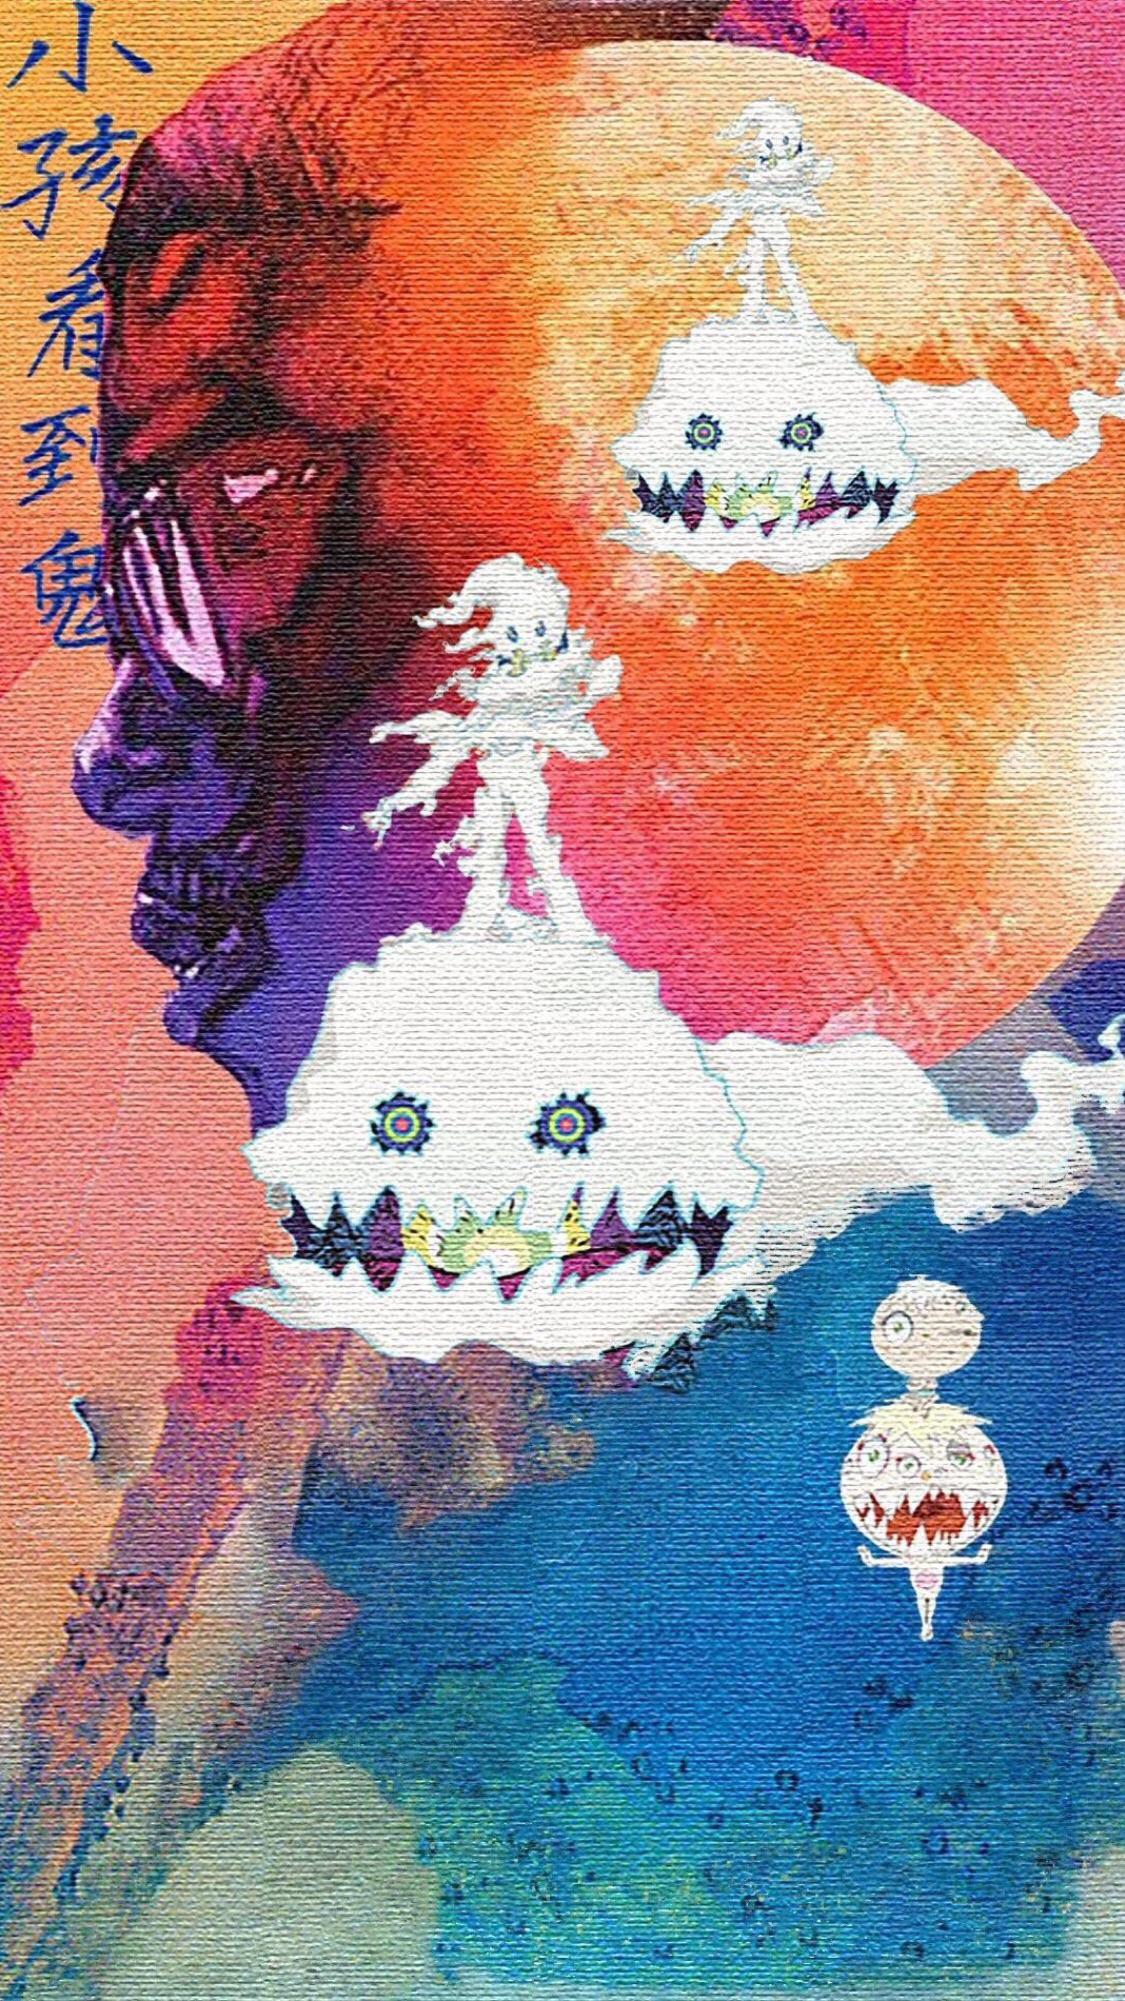 Pin By Claire Kent On Wallpapers Rapper Art Kid Cudi Wallpaper Hip Hop Art